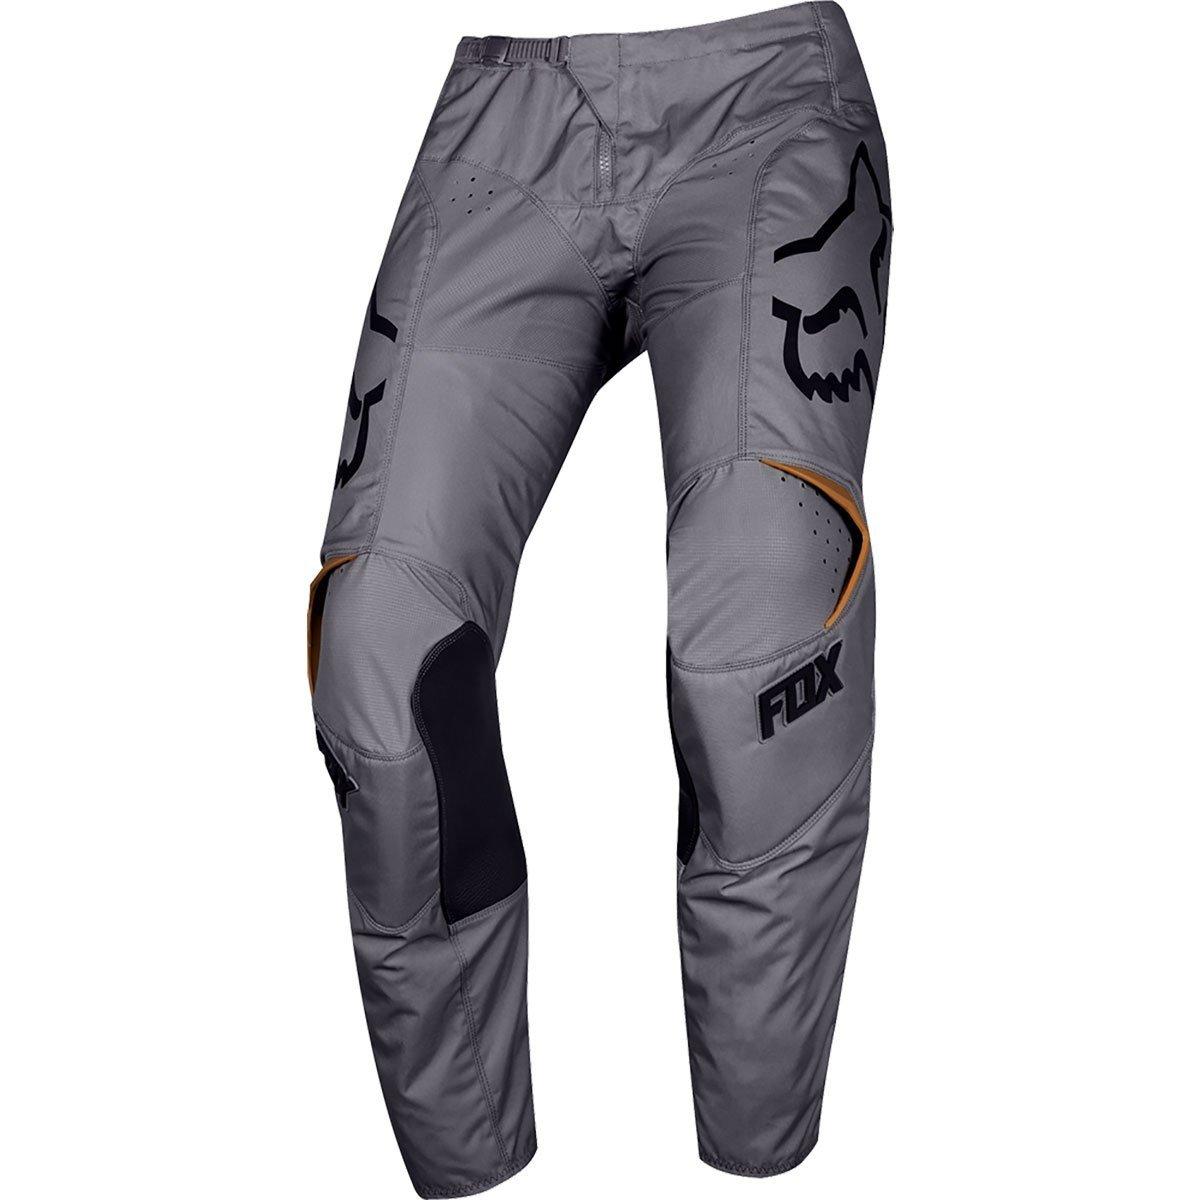 Fox Racing 180 Przm Men's Off-Road Motorcycle Pants - Stone / 30 by Fox Racing (Image #1)